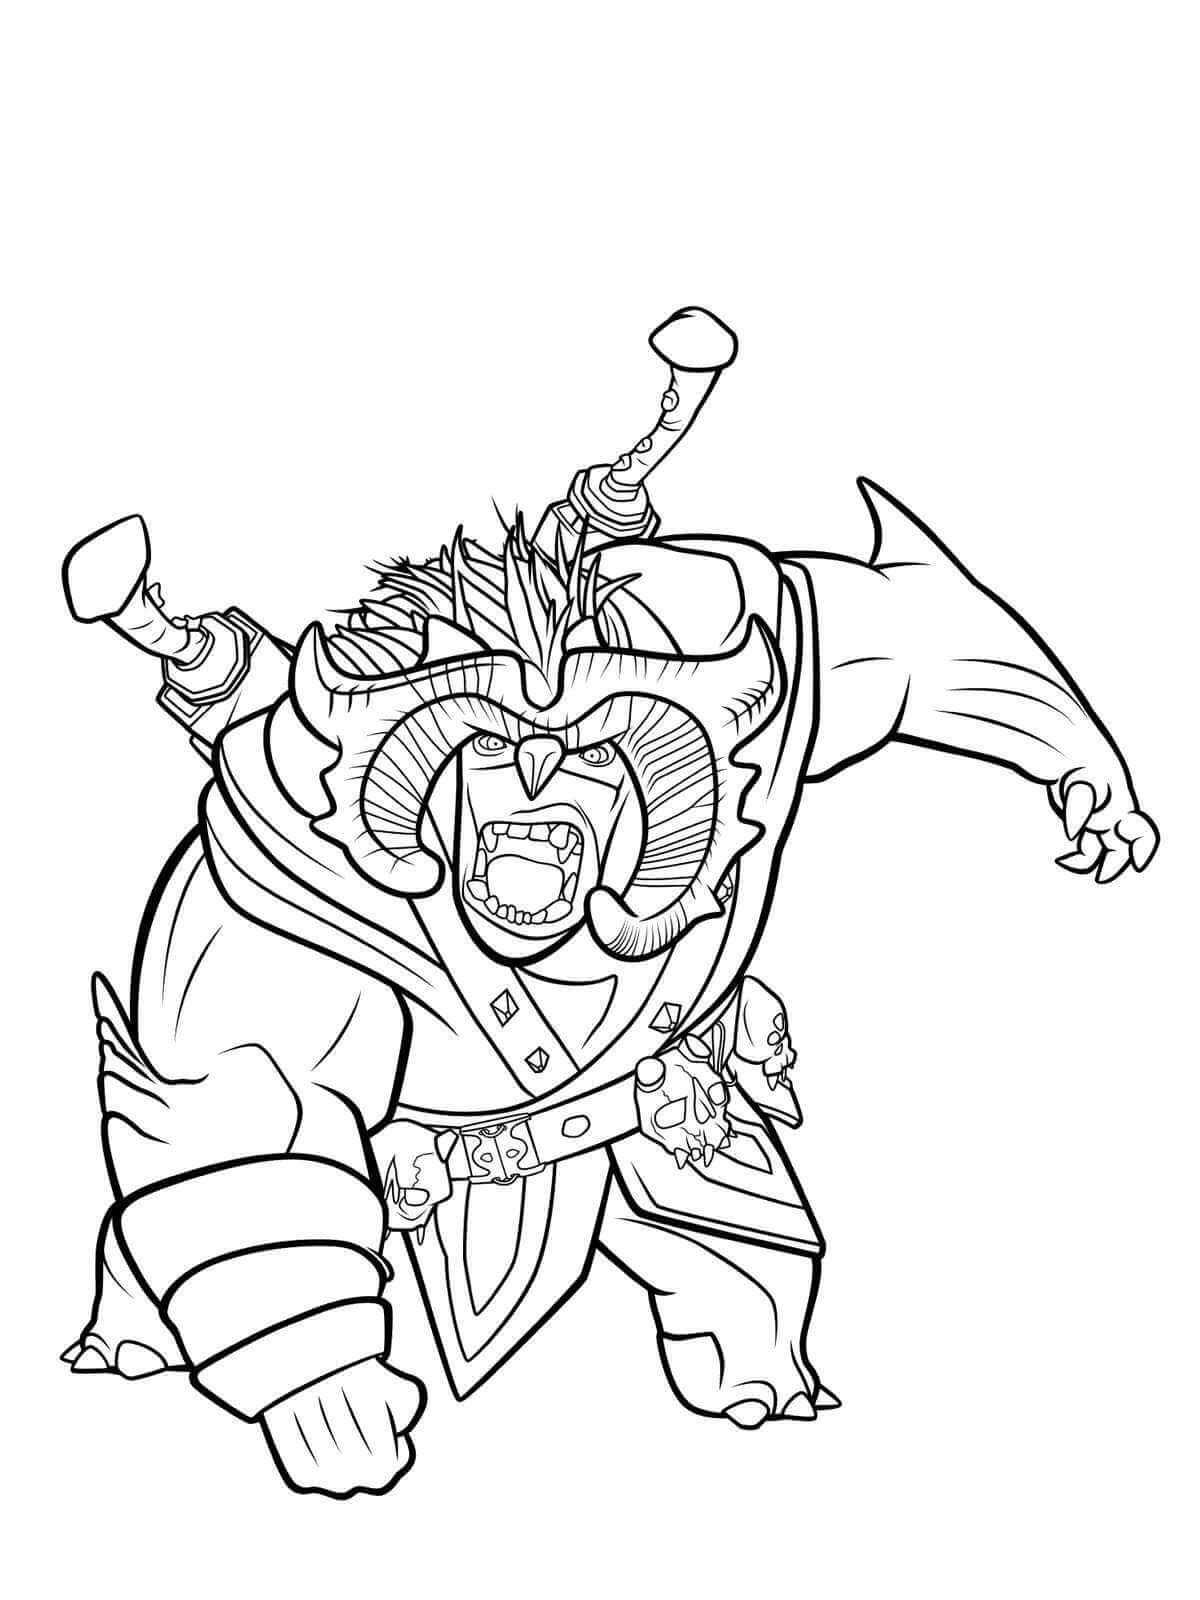 Trollhunters cazadores de trols dibujos para colorear e imprimir ...